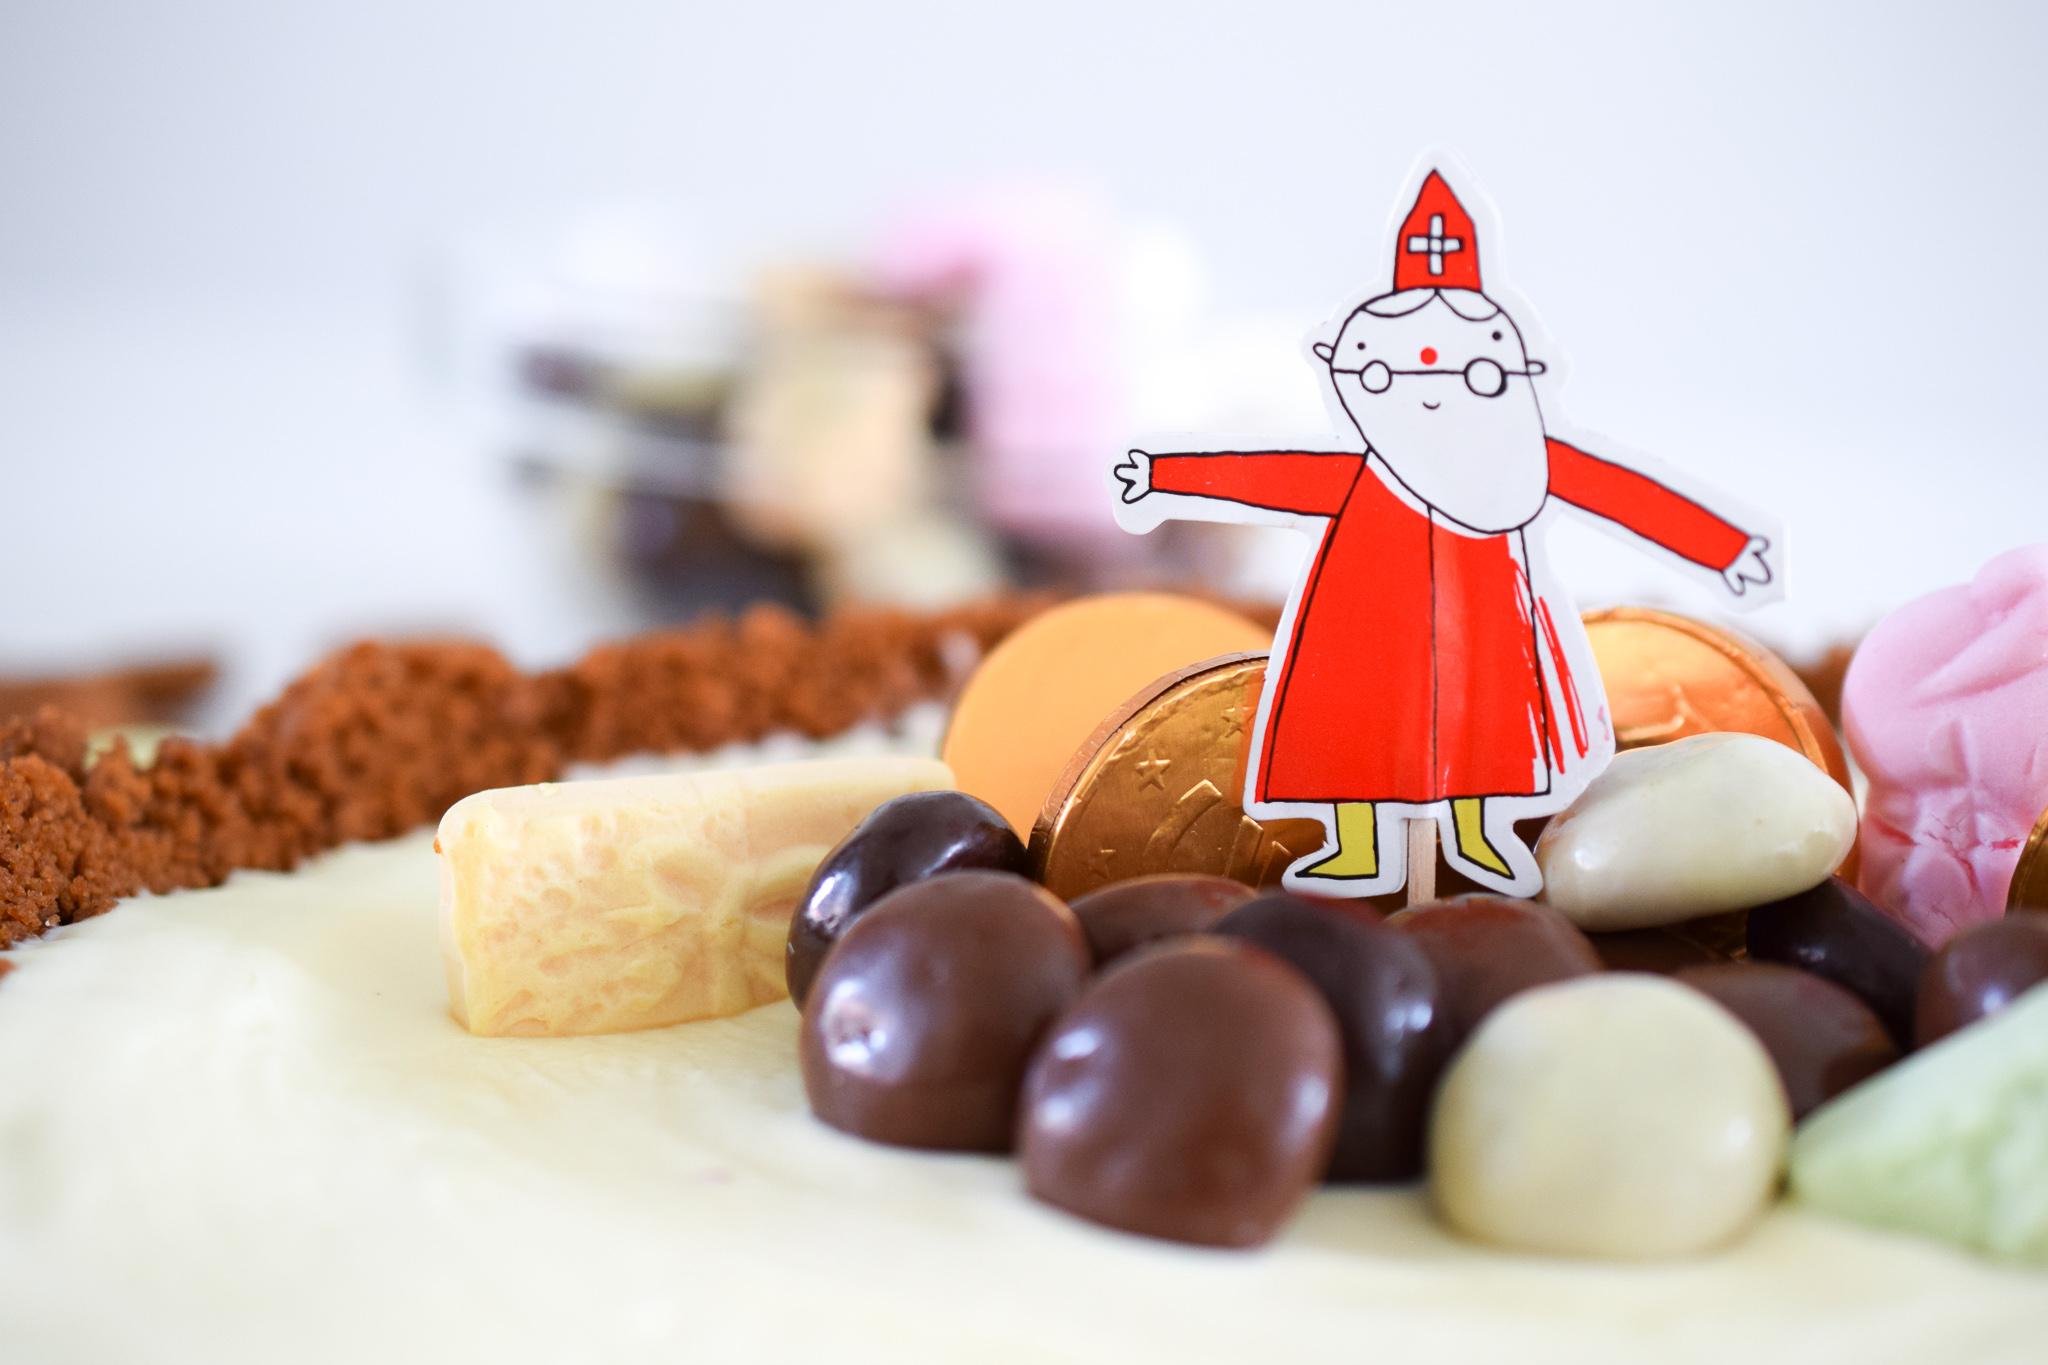 kruidnotentaart met witte chocolademousse